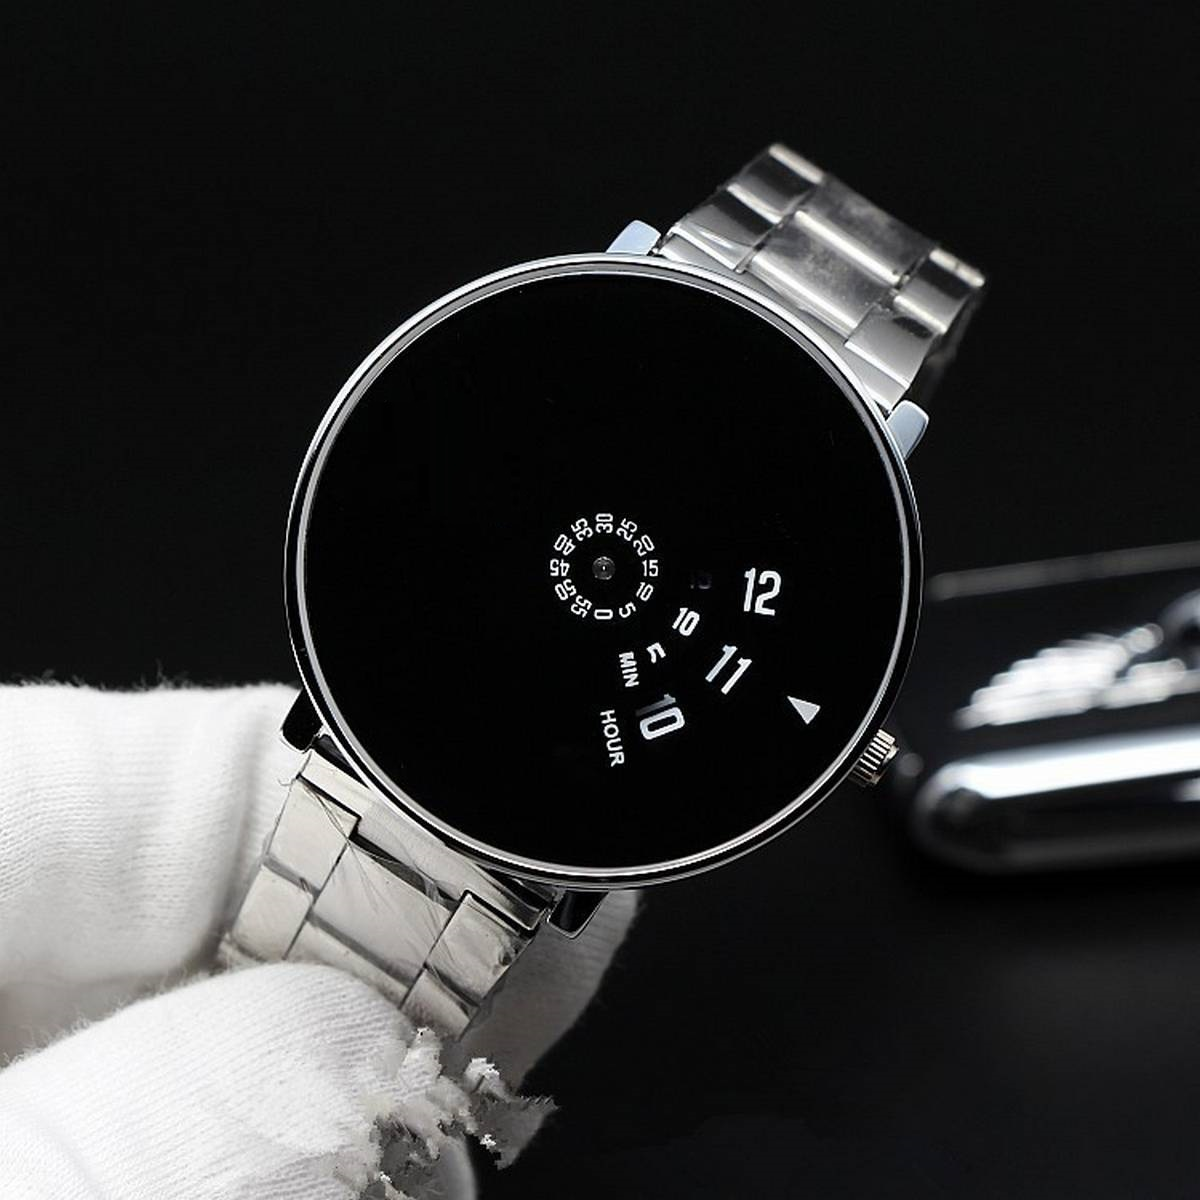 Newest Stylish Watch, MEN Sports Luxury Elegant Full Steel Watch, Ladies Wristwatch, Male Clock Quartz Relojes High Quality Watches